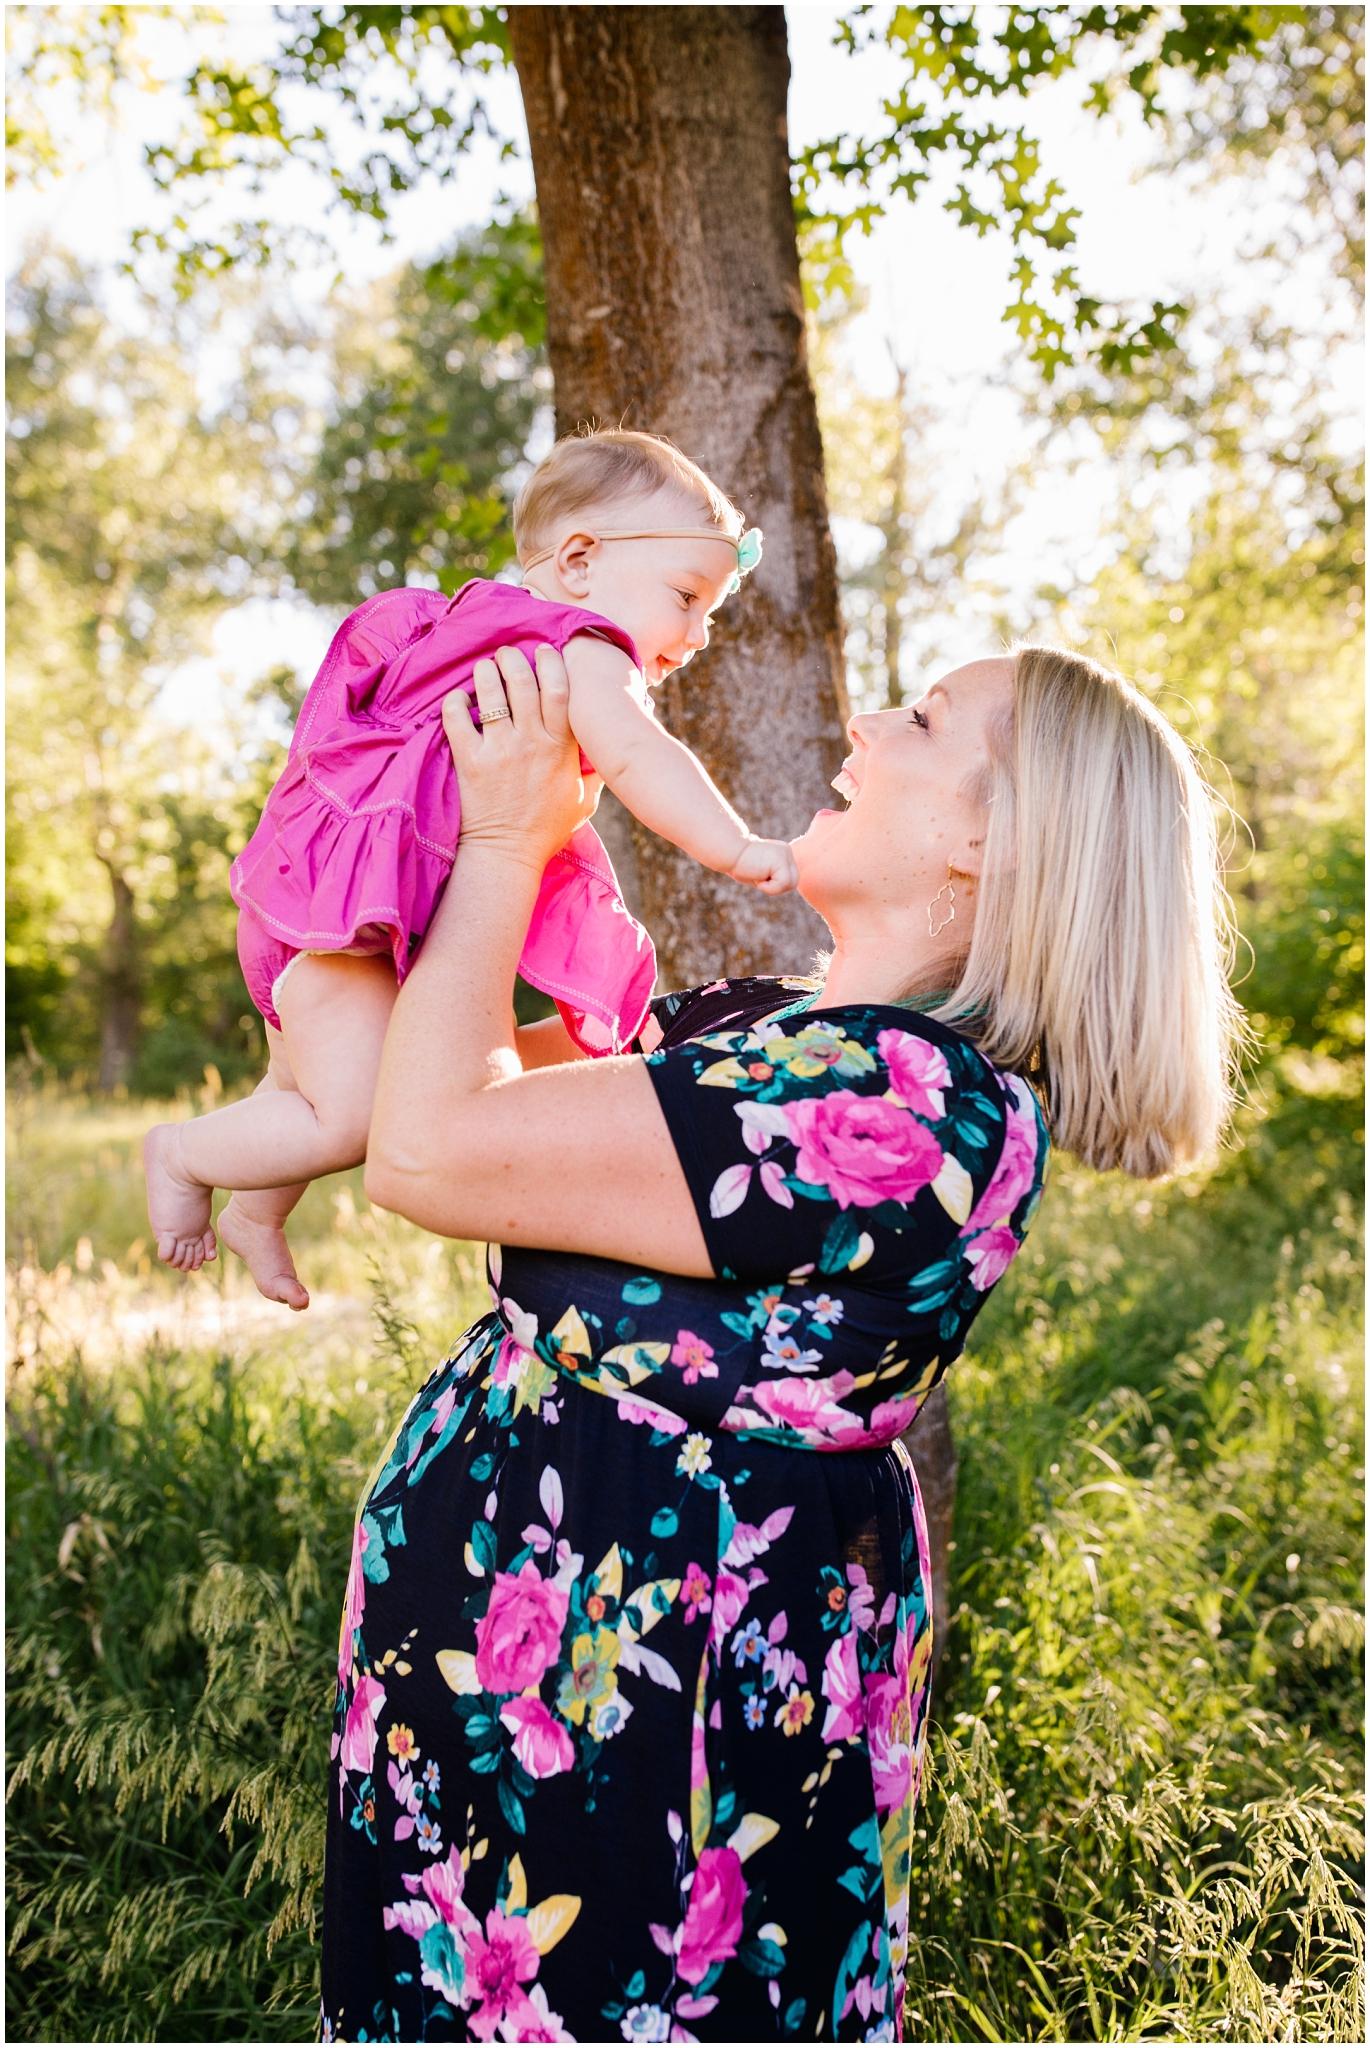 Henderson-24_Lizzie-B-Imagery-Utah-Family-Photographer-Park-City-Salt-Lake-City-Springville-Hobble-Creek-Canyon-Jolleys-Ranch.jpg